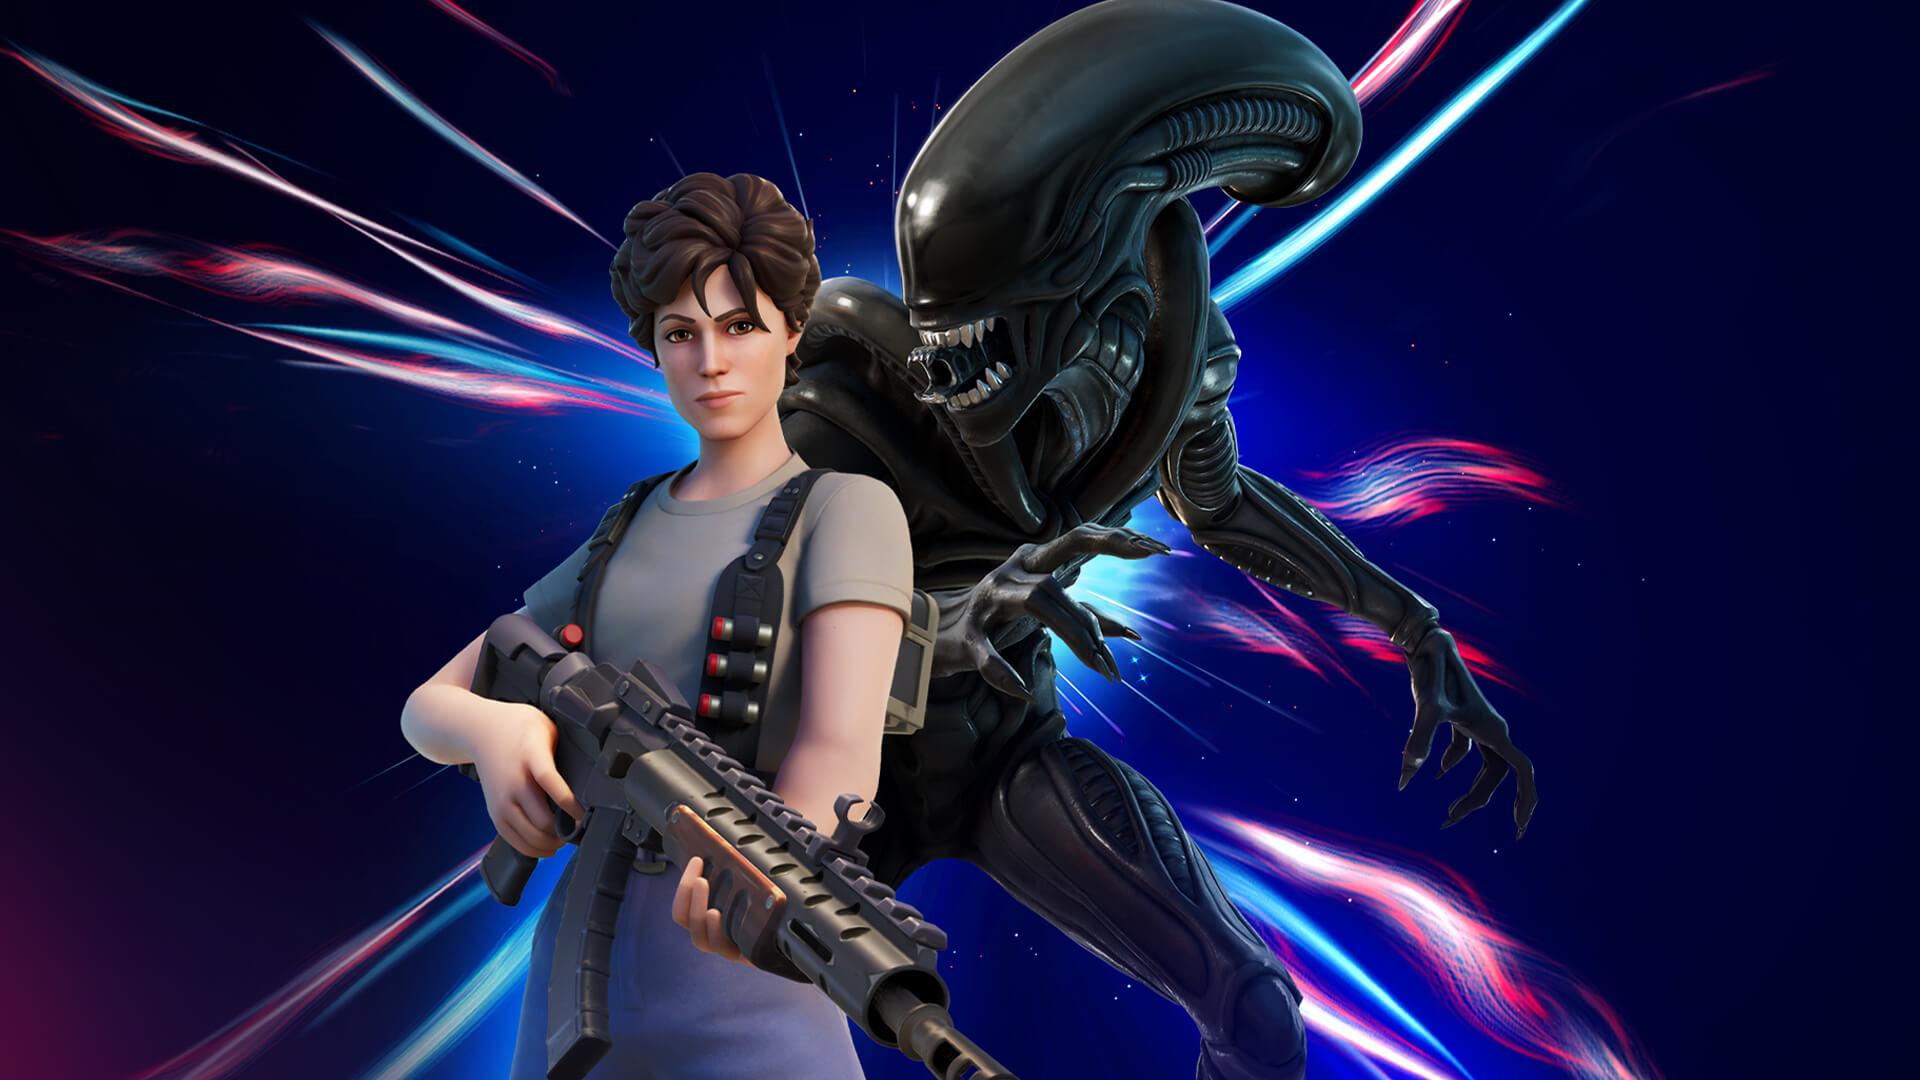 Ripley y Xenomorfo de Fortnite